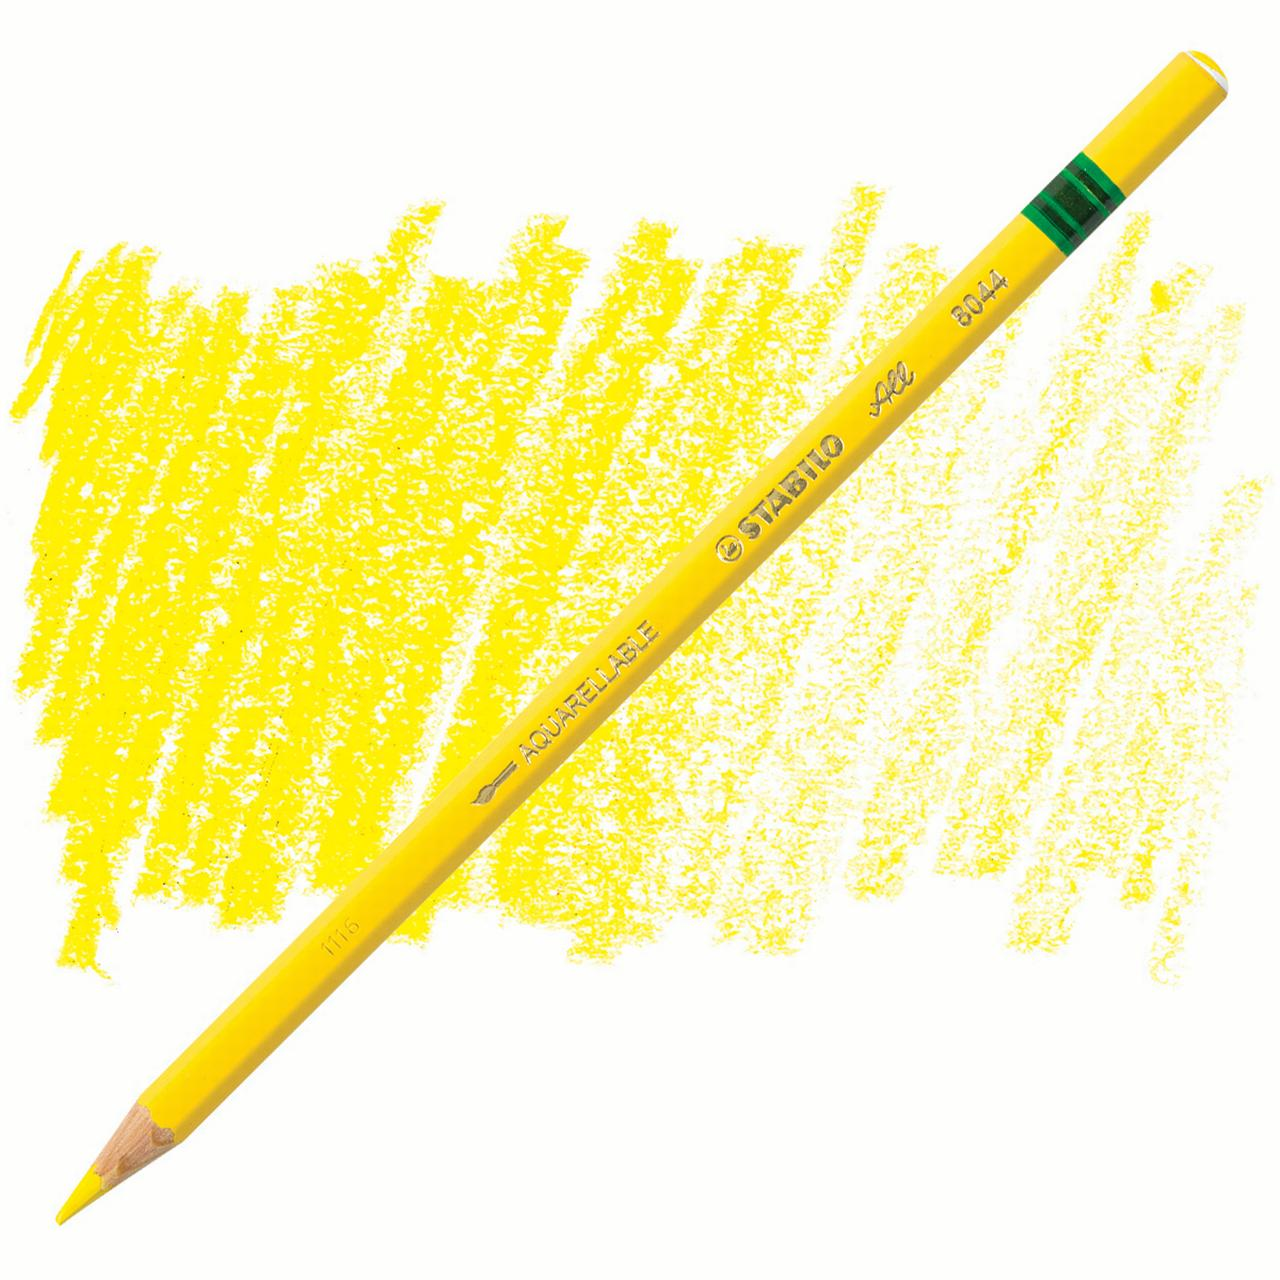 Stabilo Colored Marking Pencil - Yellow - Walmart.com ...